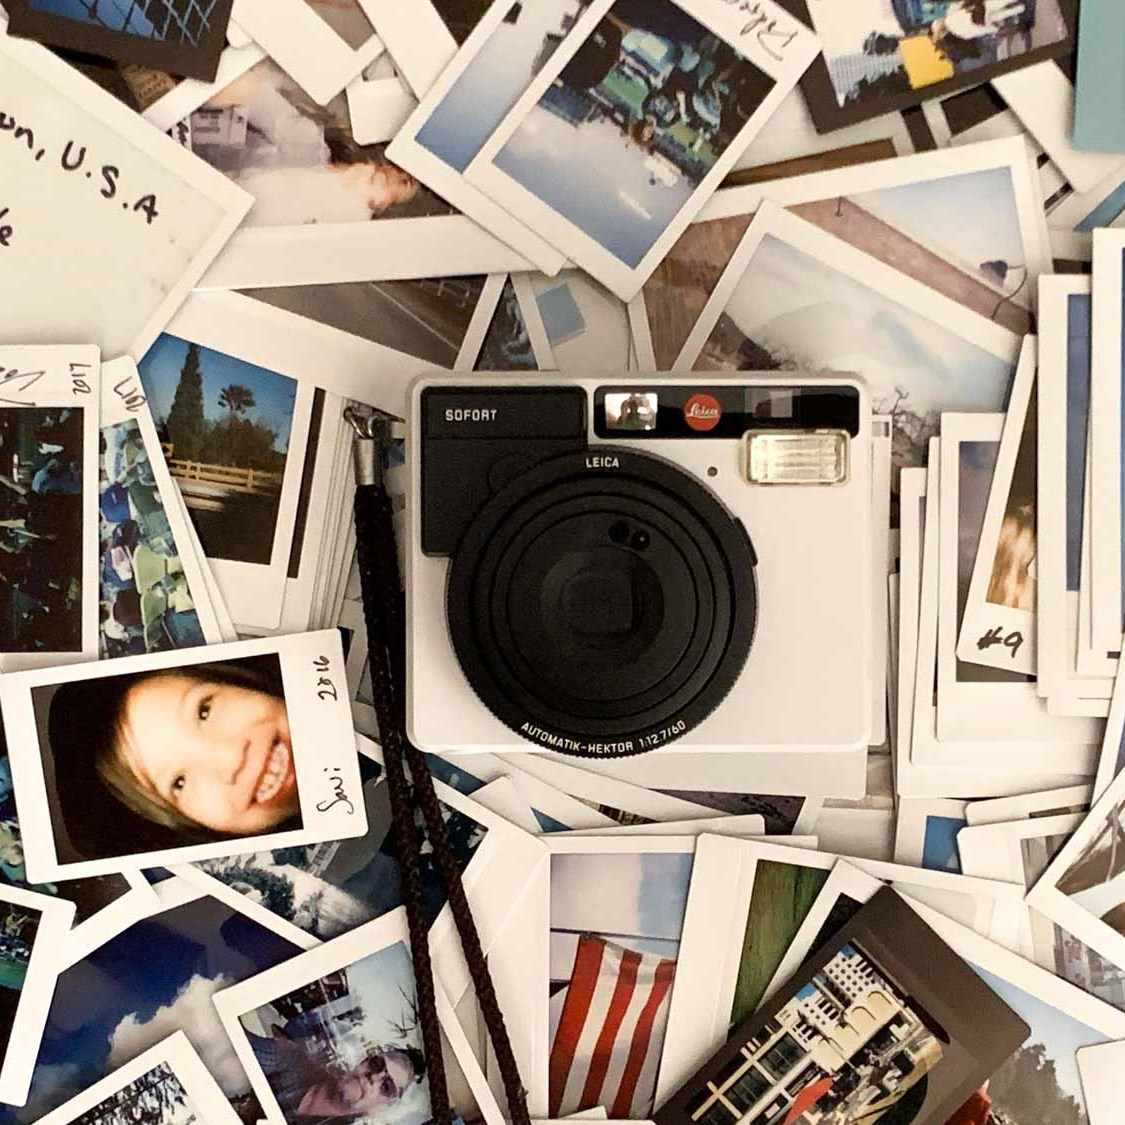 Instax - Leica Sofort